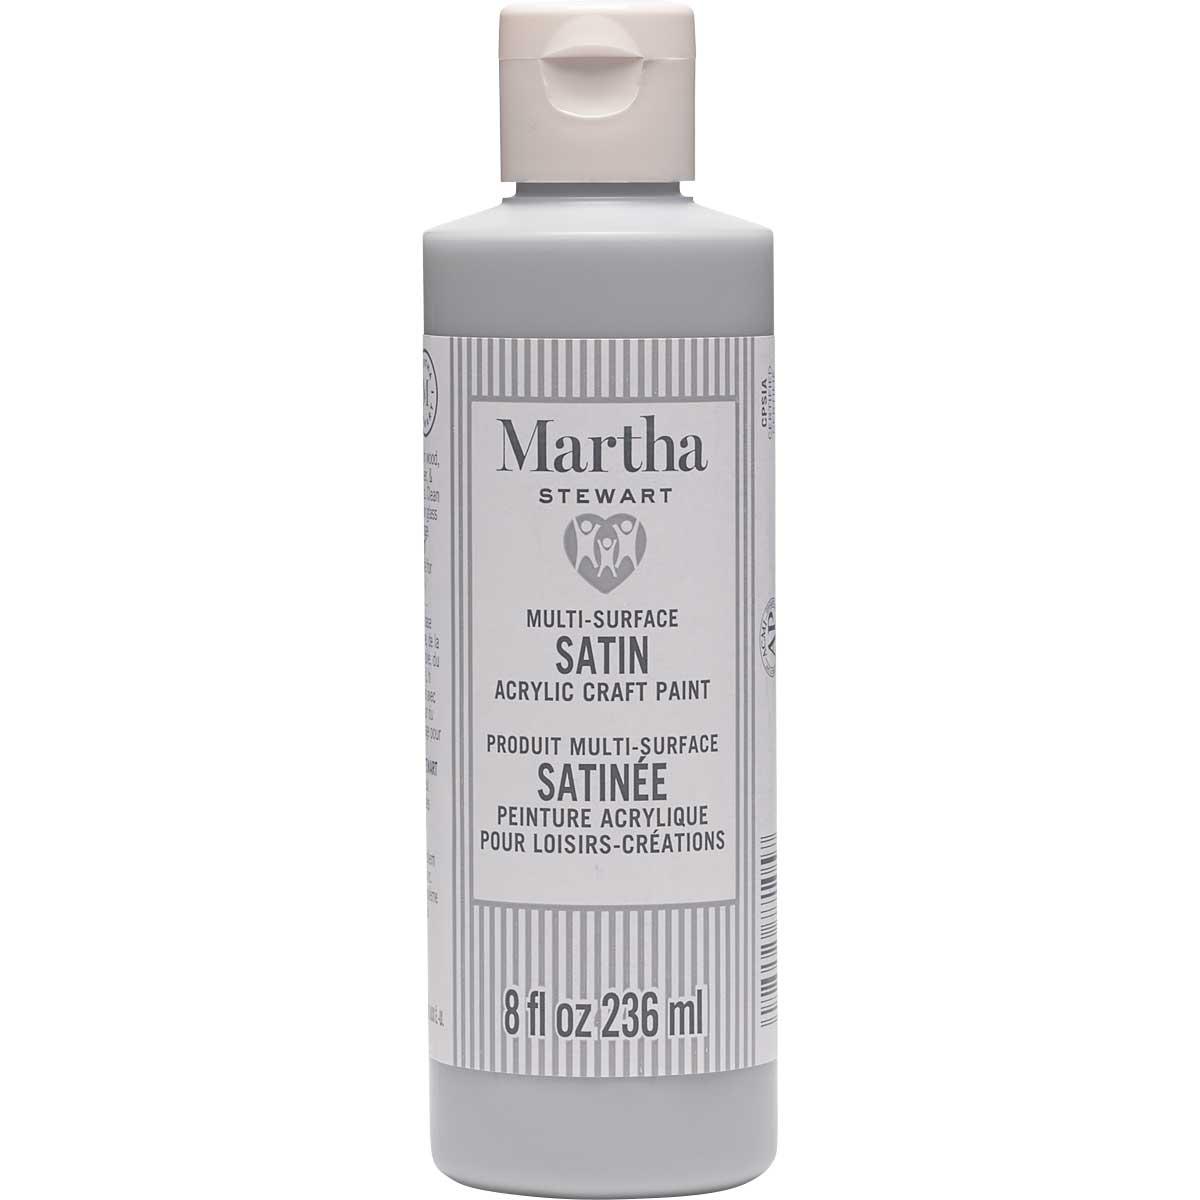 Martha Stewart ® Multi-Surface Satin Acrylic Craft Paint CPSIA - Cool Gray, 8 oz. - 77105